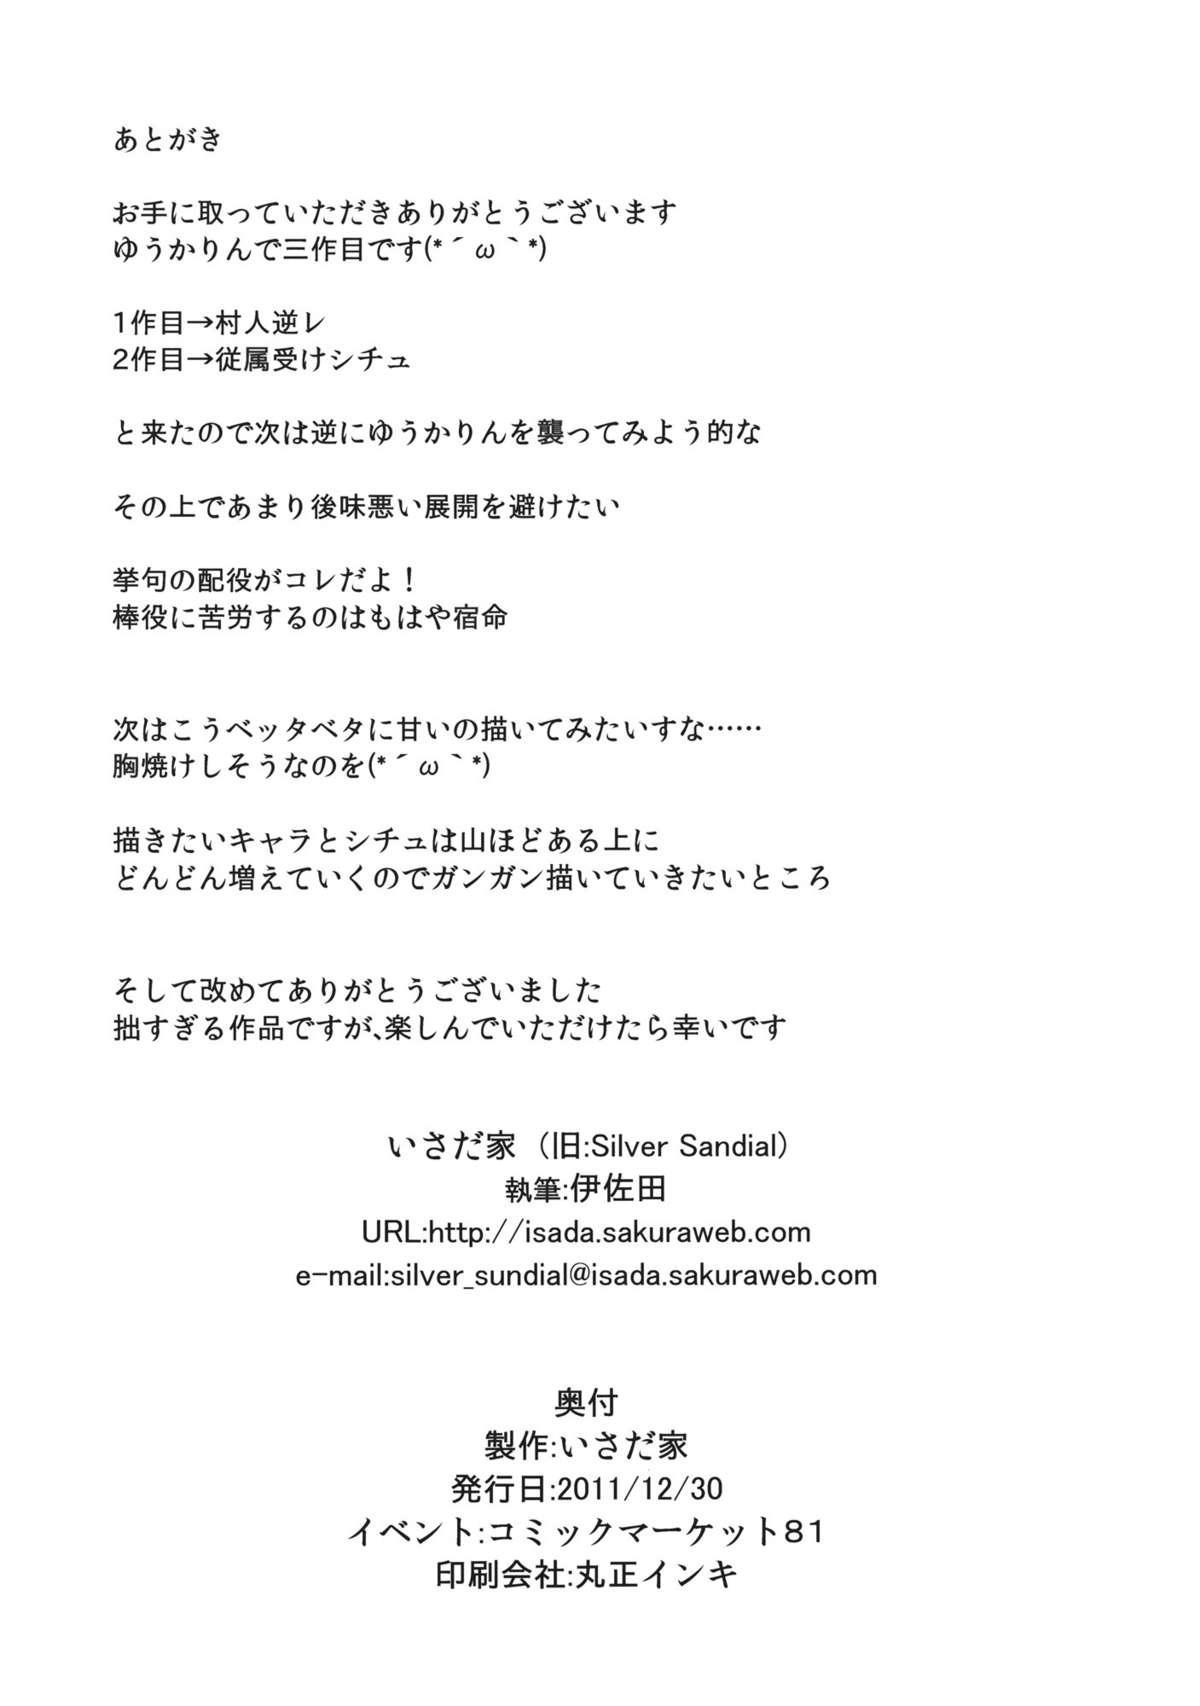 Kazami-ke Saikyou Densetsu R 25